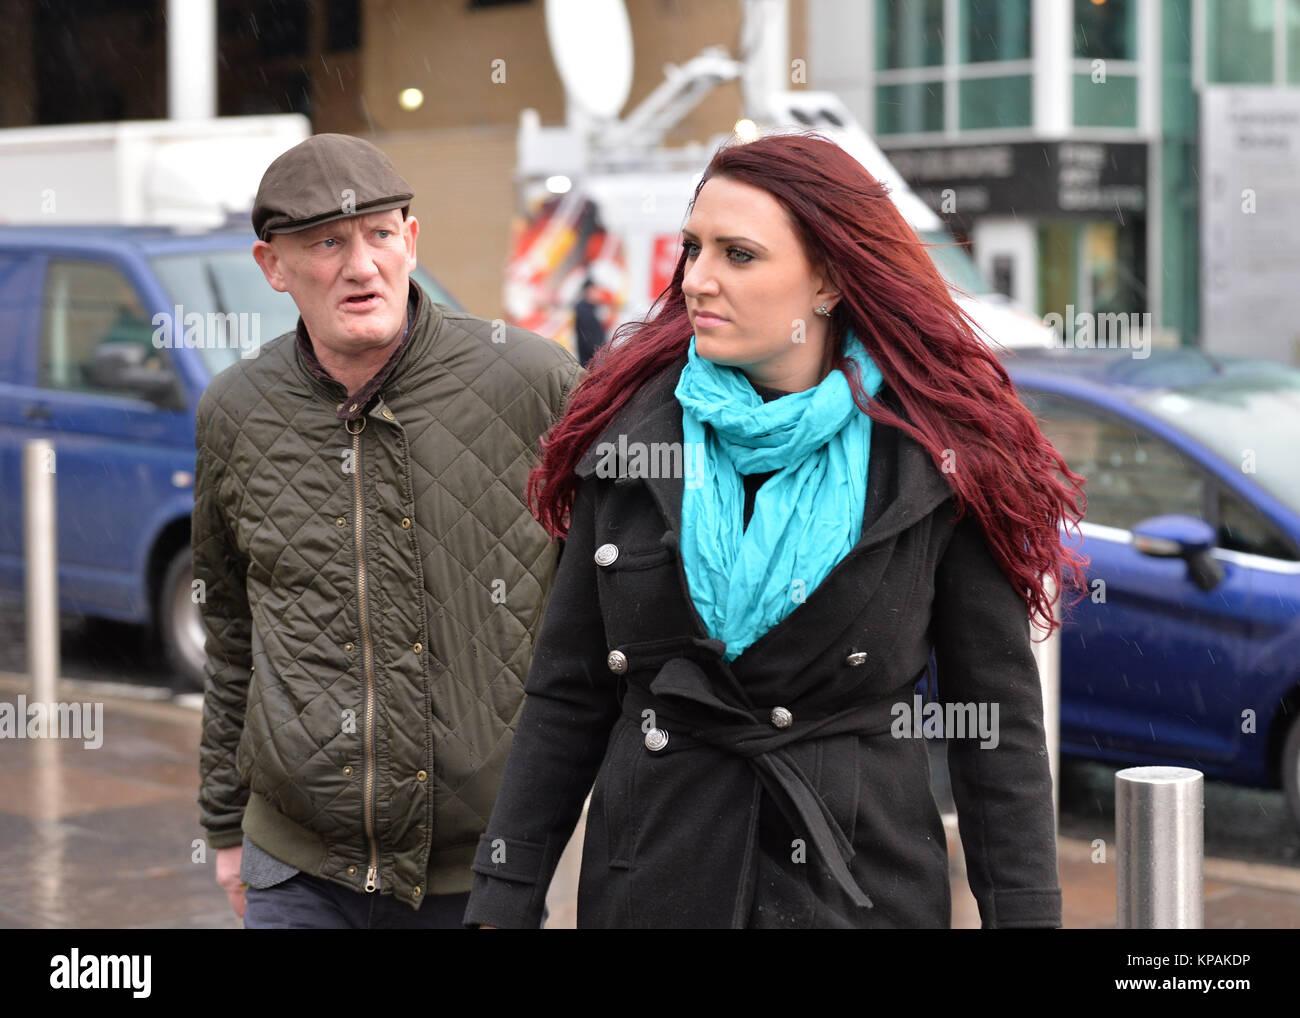 Belfast, Northern Ireland, U.K. 14th Dec 2017. Britain First's Jayda Fransen making her first court appearance - Stock Image